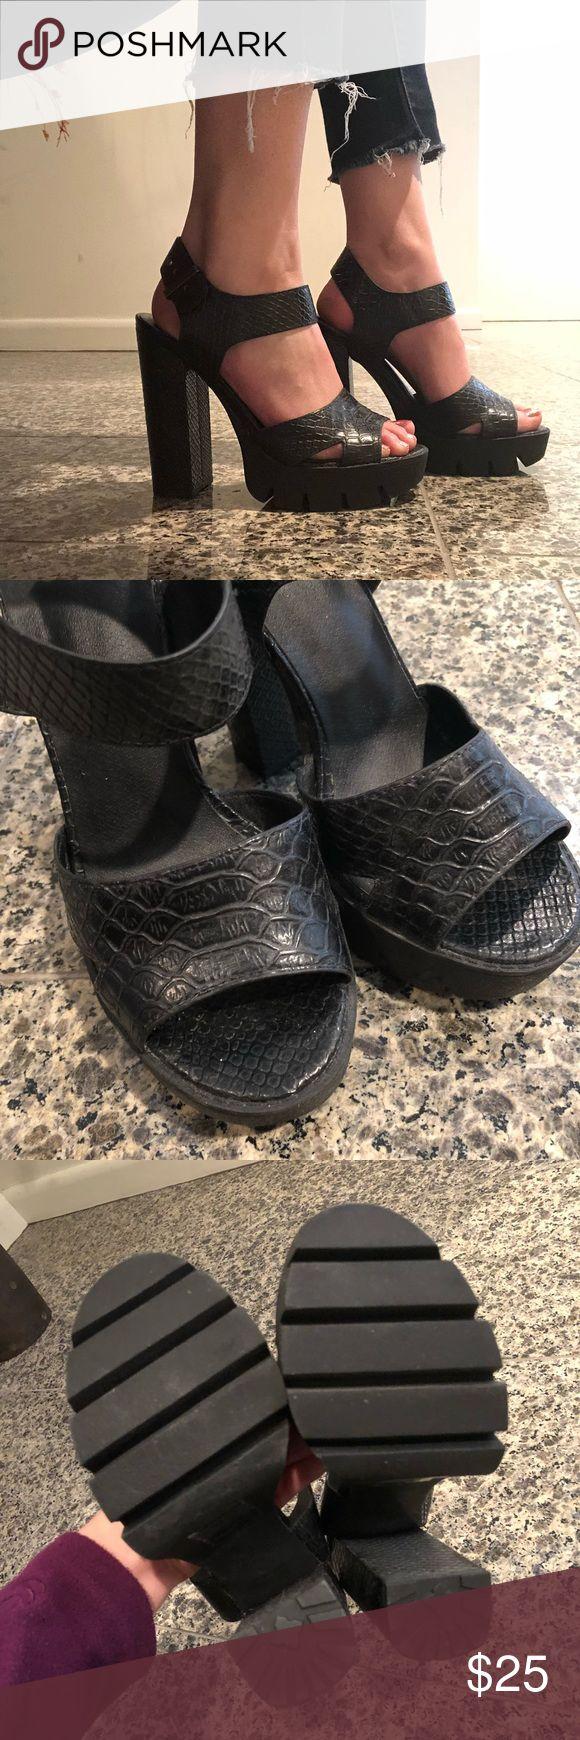 "Asos Platform Heels Snake print platform heels. Worn twice. 5"" heel with 1.25"" platform (approximately). UK size 4 = Euro 37 = US 6, according to Asos website. I'm a size 6.5 for reference. ASOS Shoes Heels"